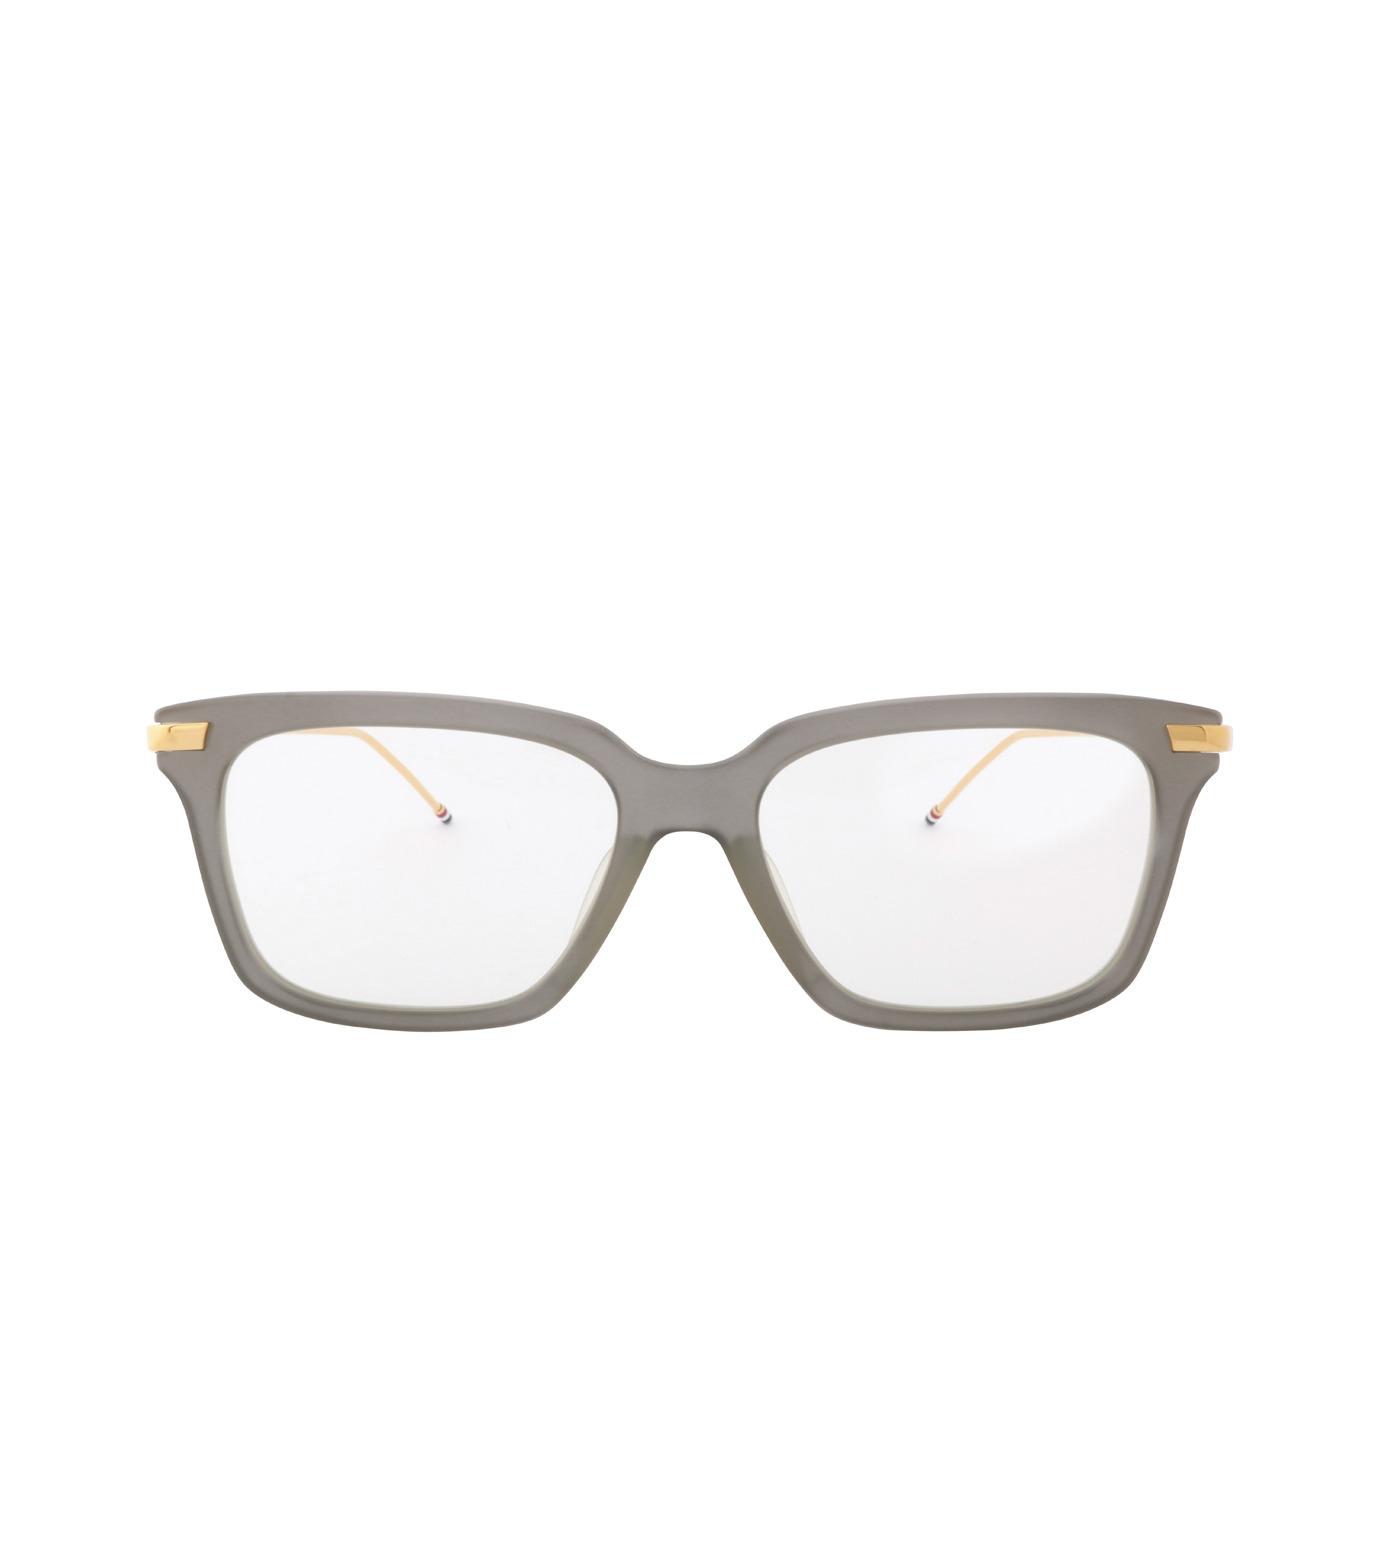 Thom Browne Eye Wear(トム・ブラウン・アイウェア)のWellington Clear Lens-GRAY(アイウェア/eyewear)-TB-701-G-11 拡大詳細画像3